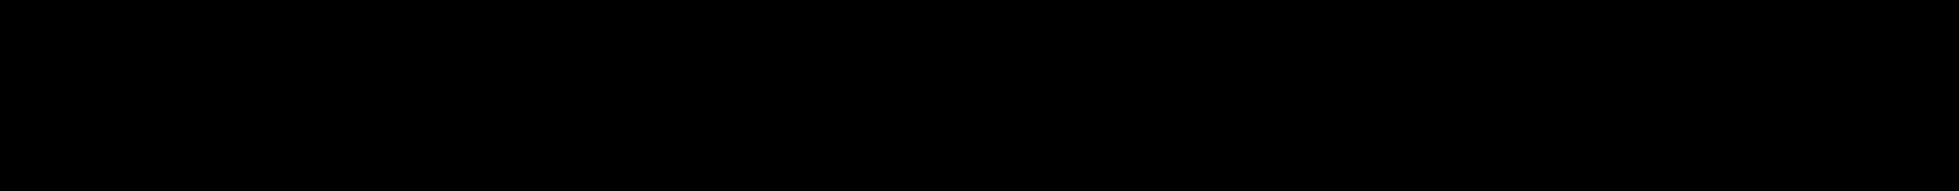 Design System F 700I